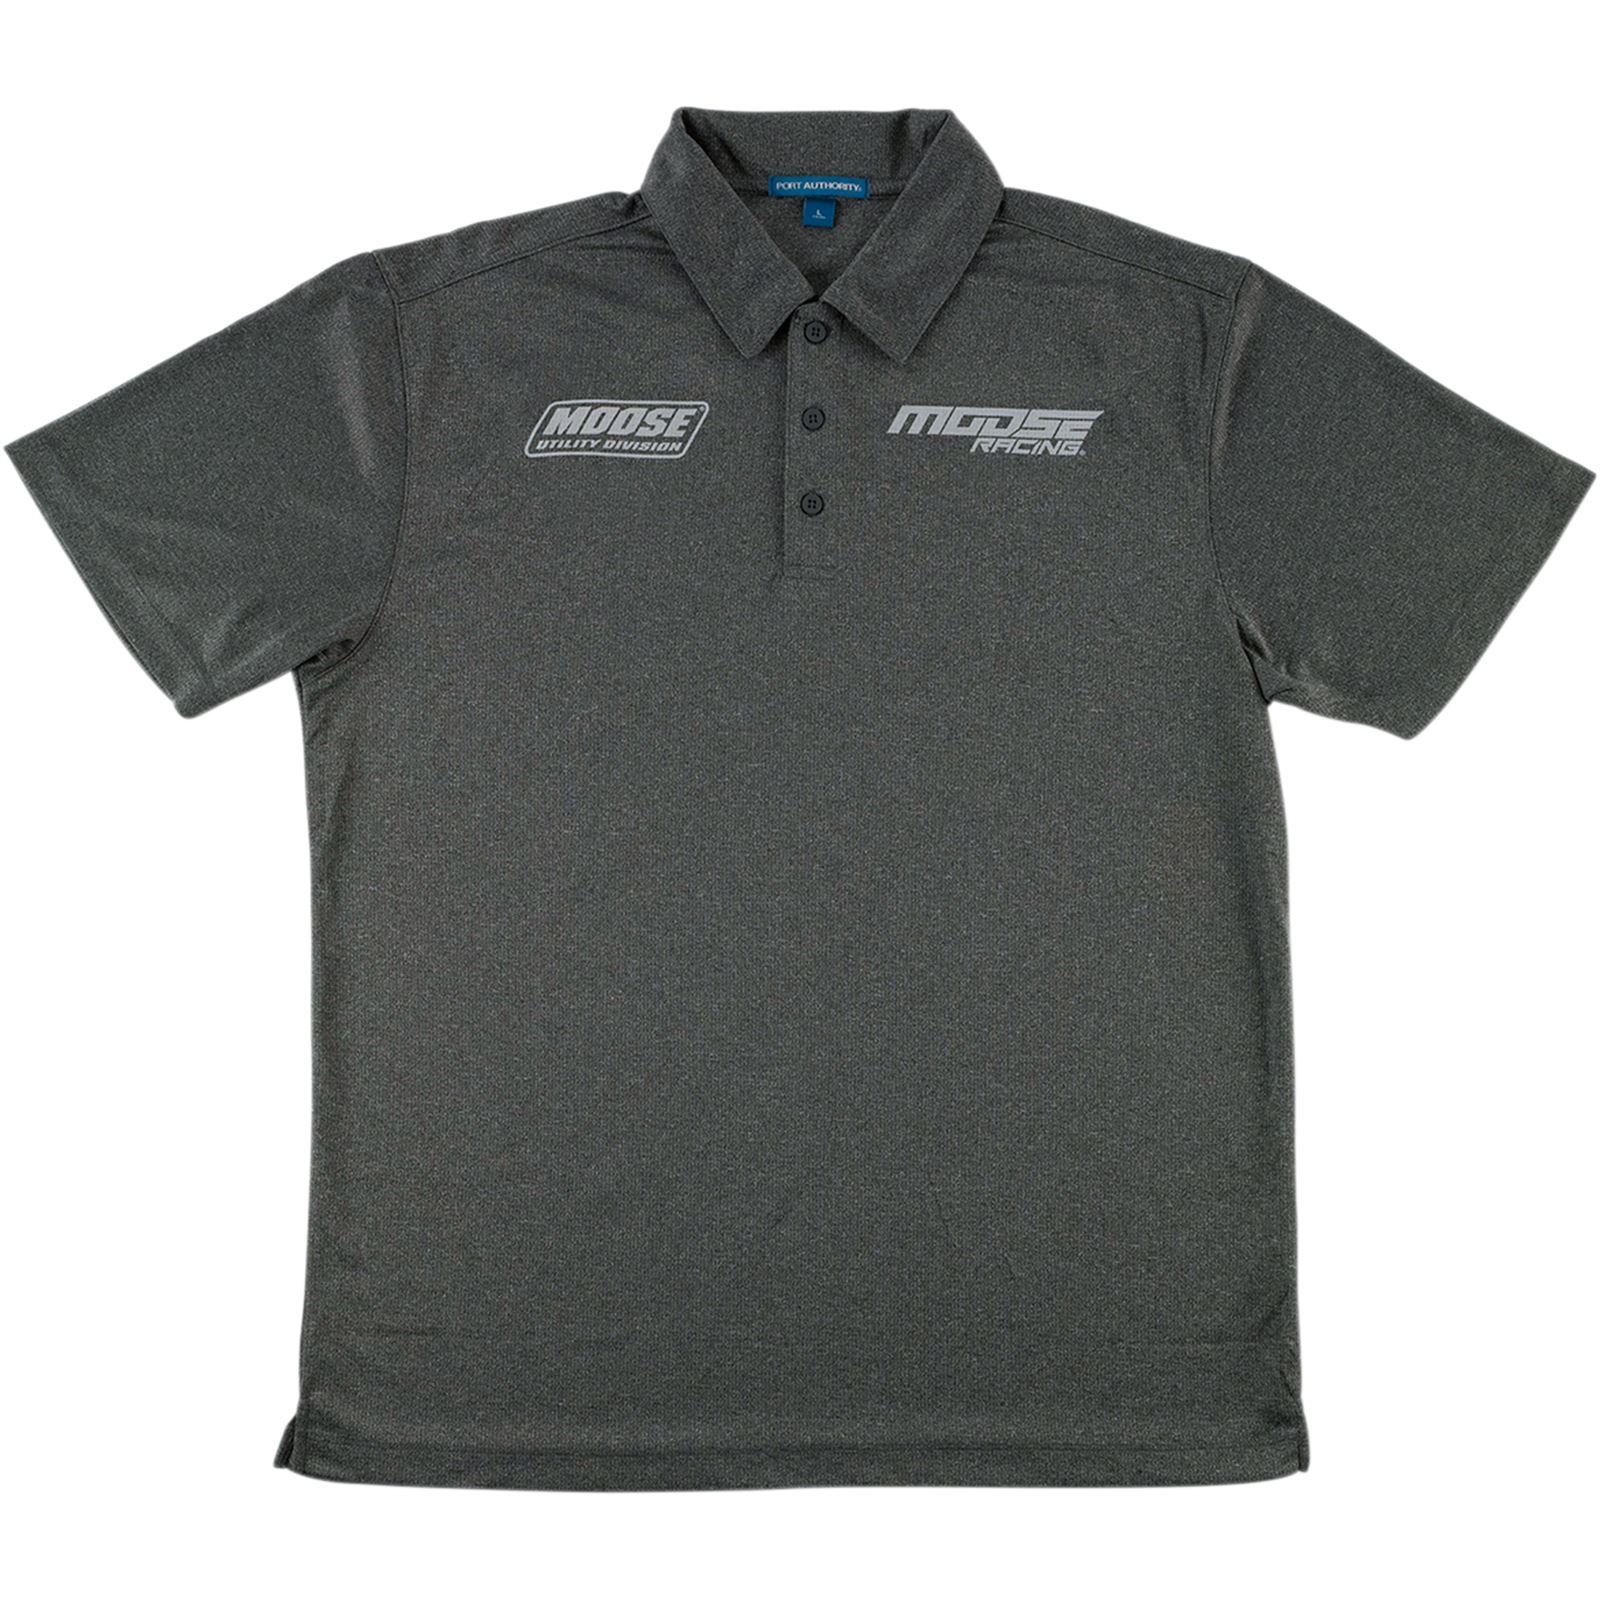 Moose Racing Polo Shirt - Charcoal Heather - 3X-Large